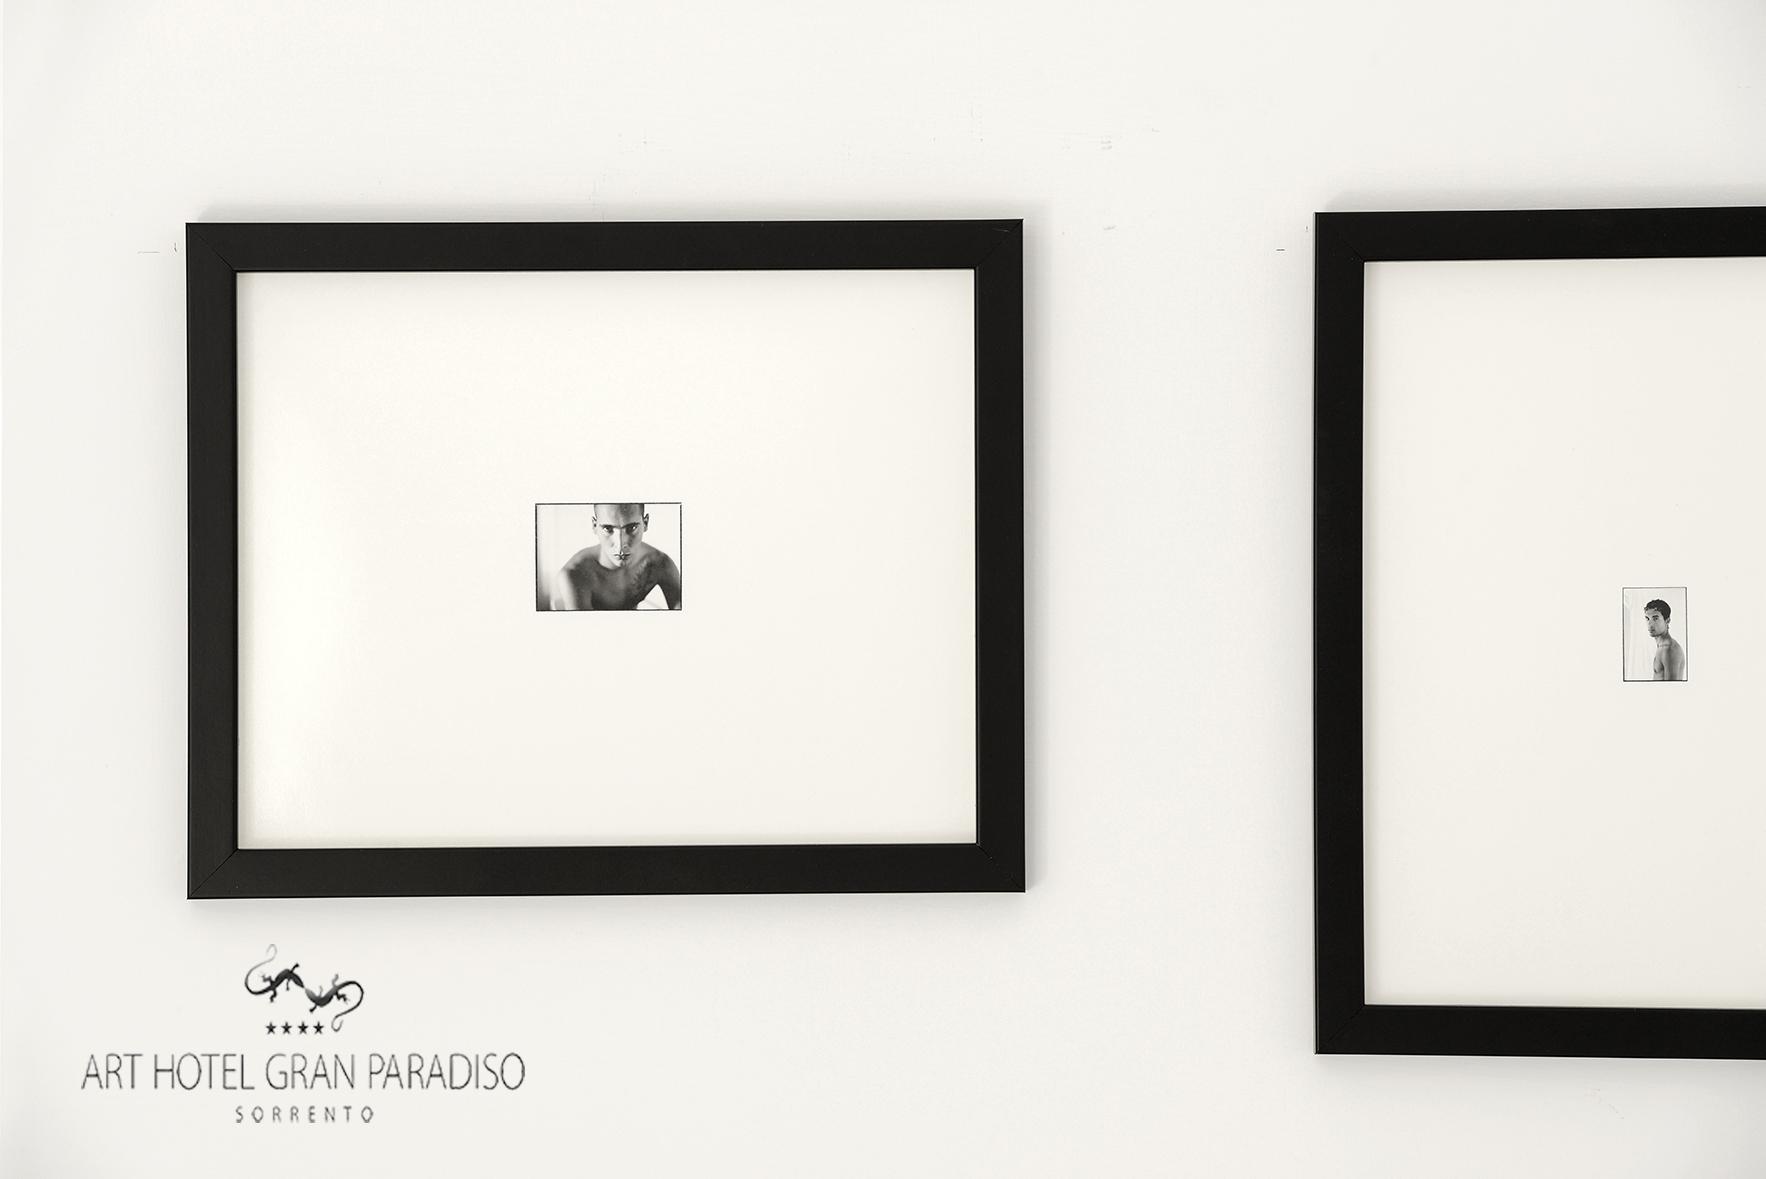 Art_Hotel_Gran_Paradiso_2013_412_Luca_Massimo_Barbero_7.jpg